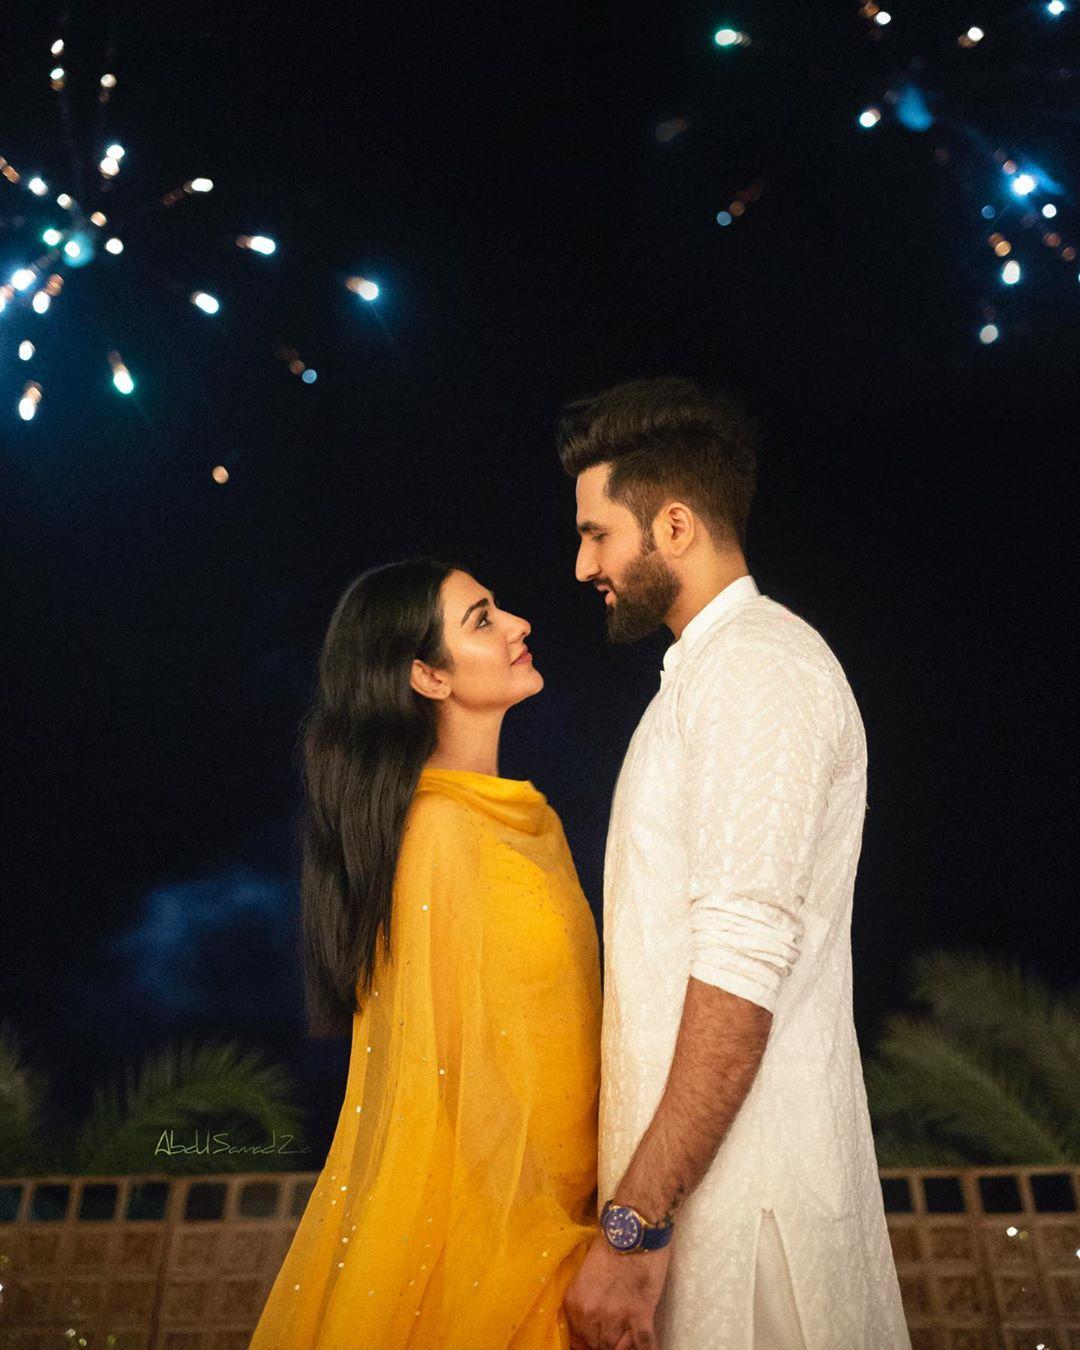 Sarah Khan and Falak Shabbir Beautiful Clicks from Their Mehndi